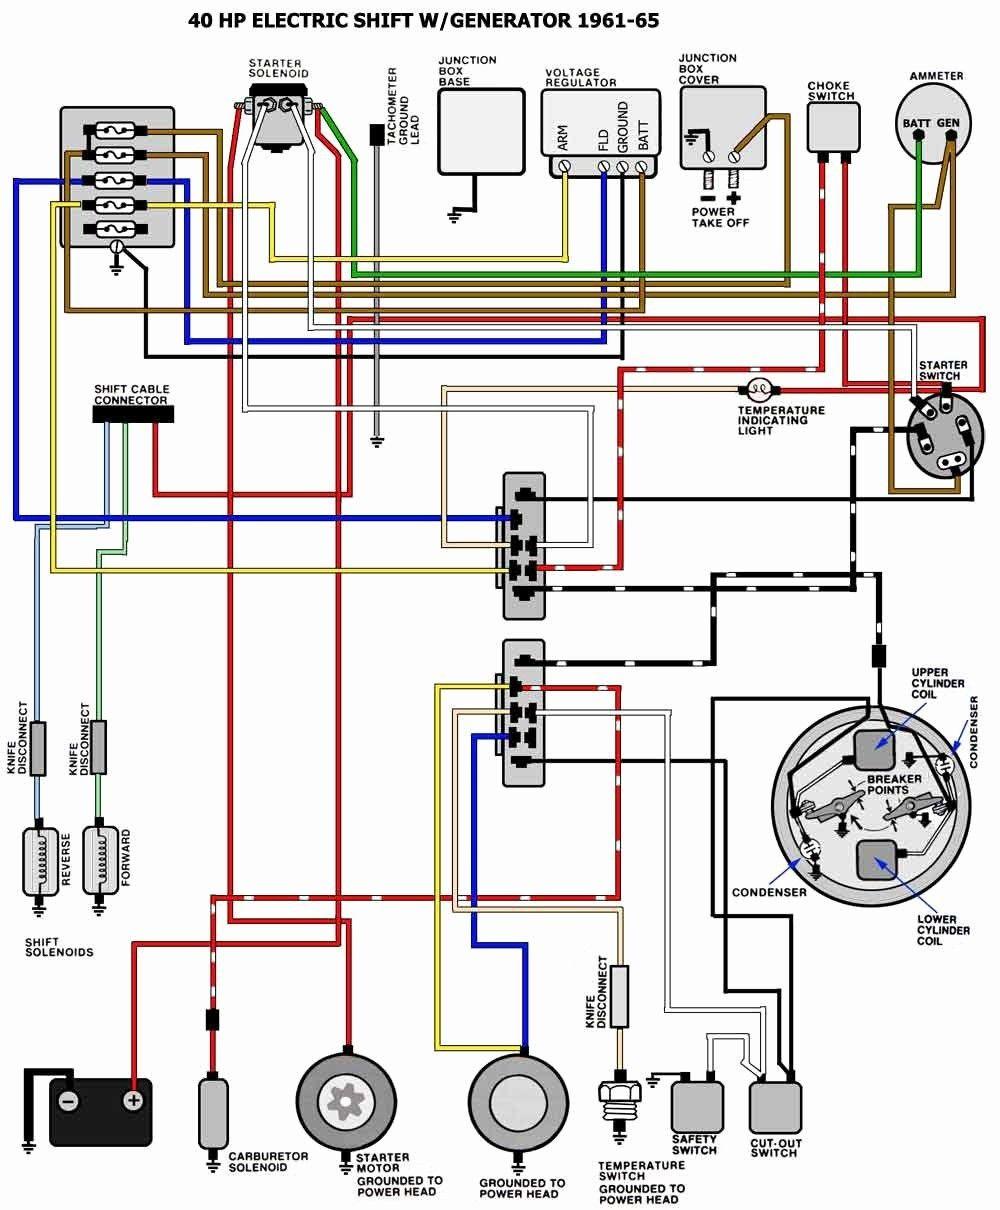 1979 Mercury Outboard Internal Wiring Harness Diagram